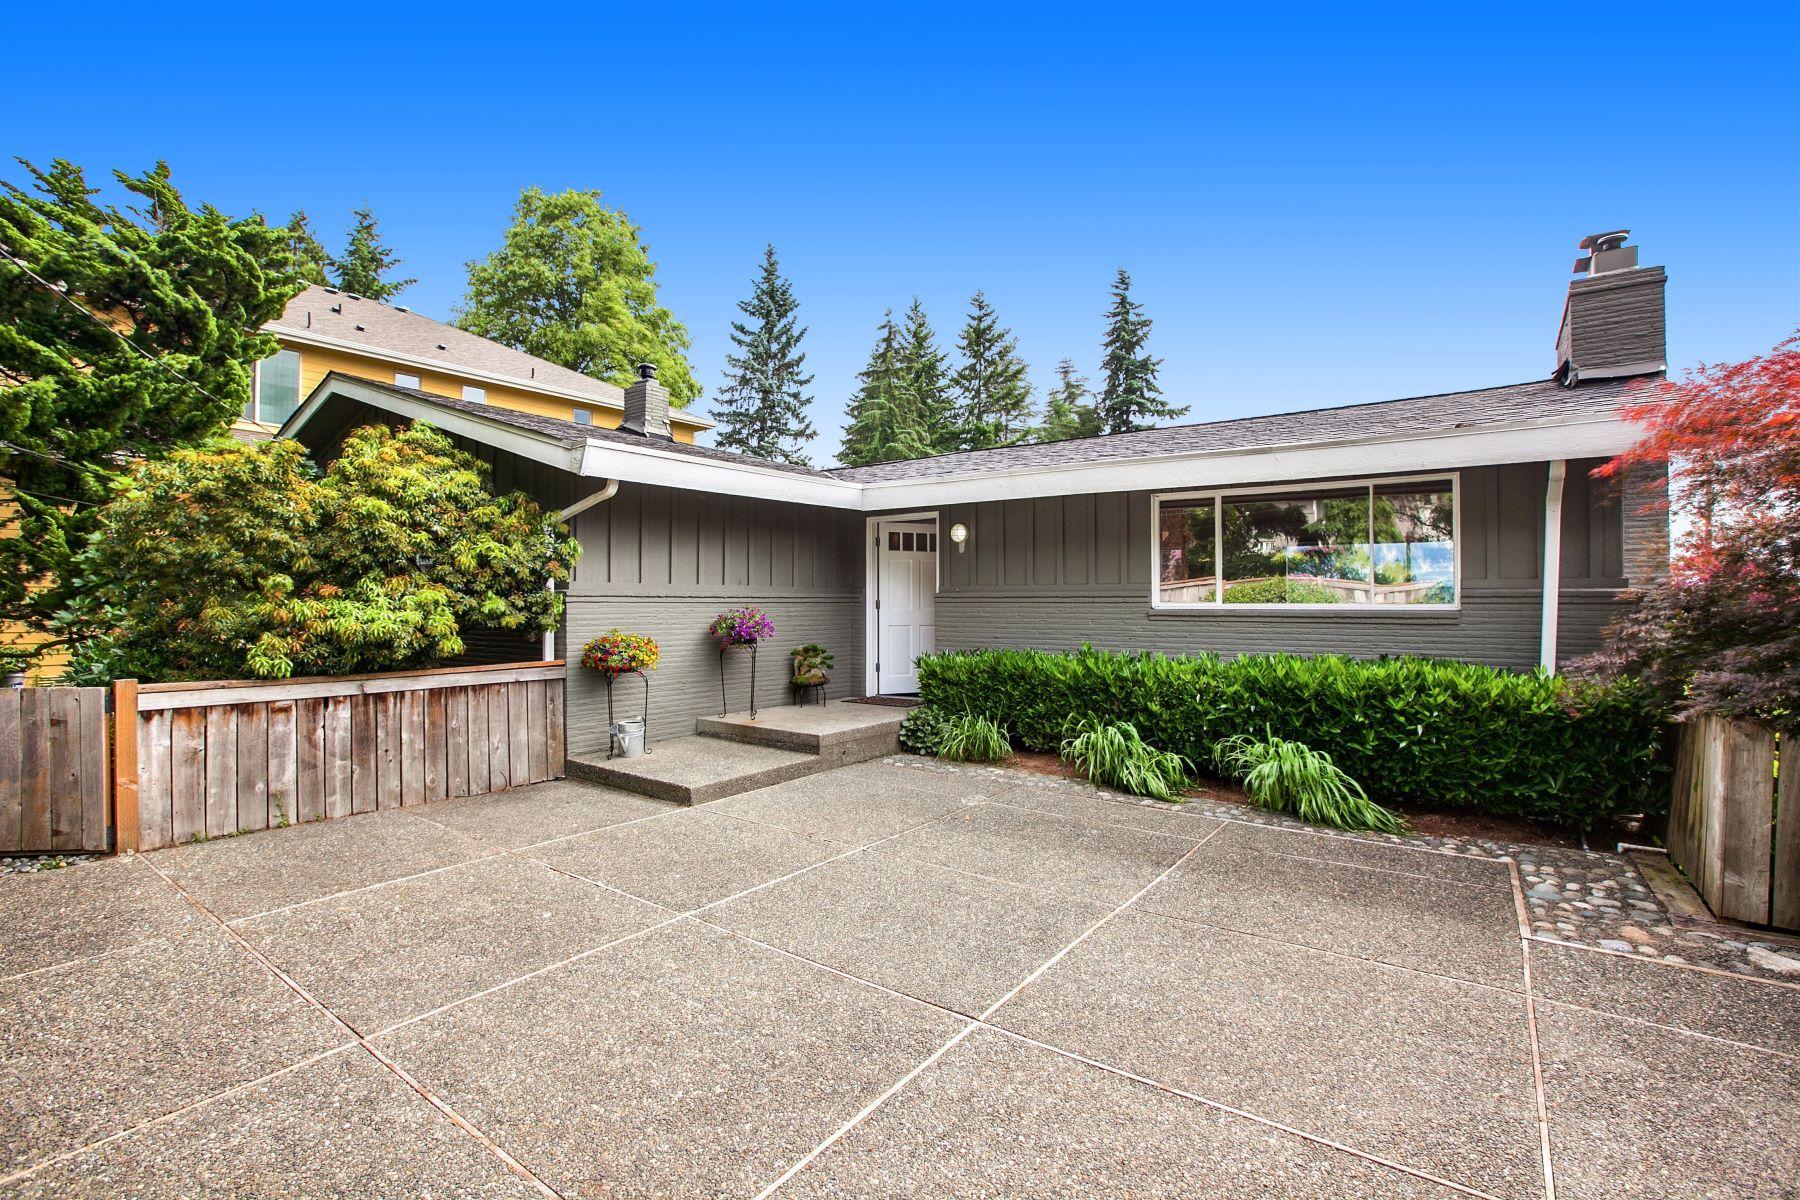 Single Family Home for Sale at 2304 100th Avenue NE Bellevue, Washington, 98004 United States